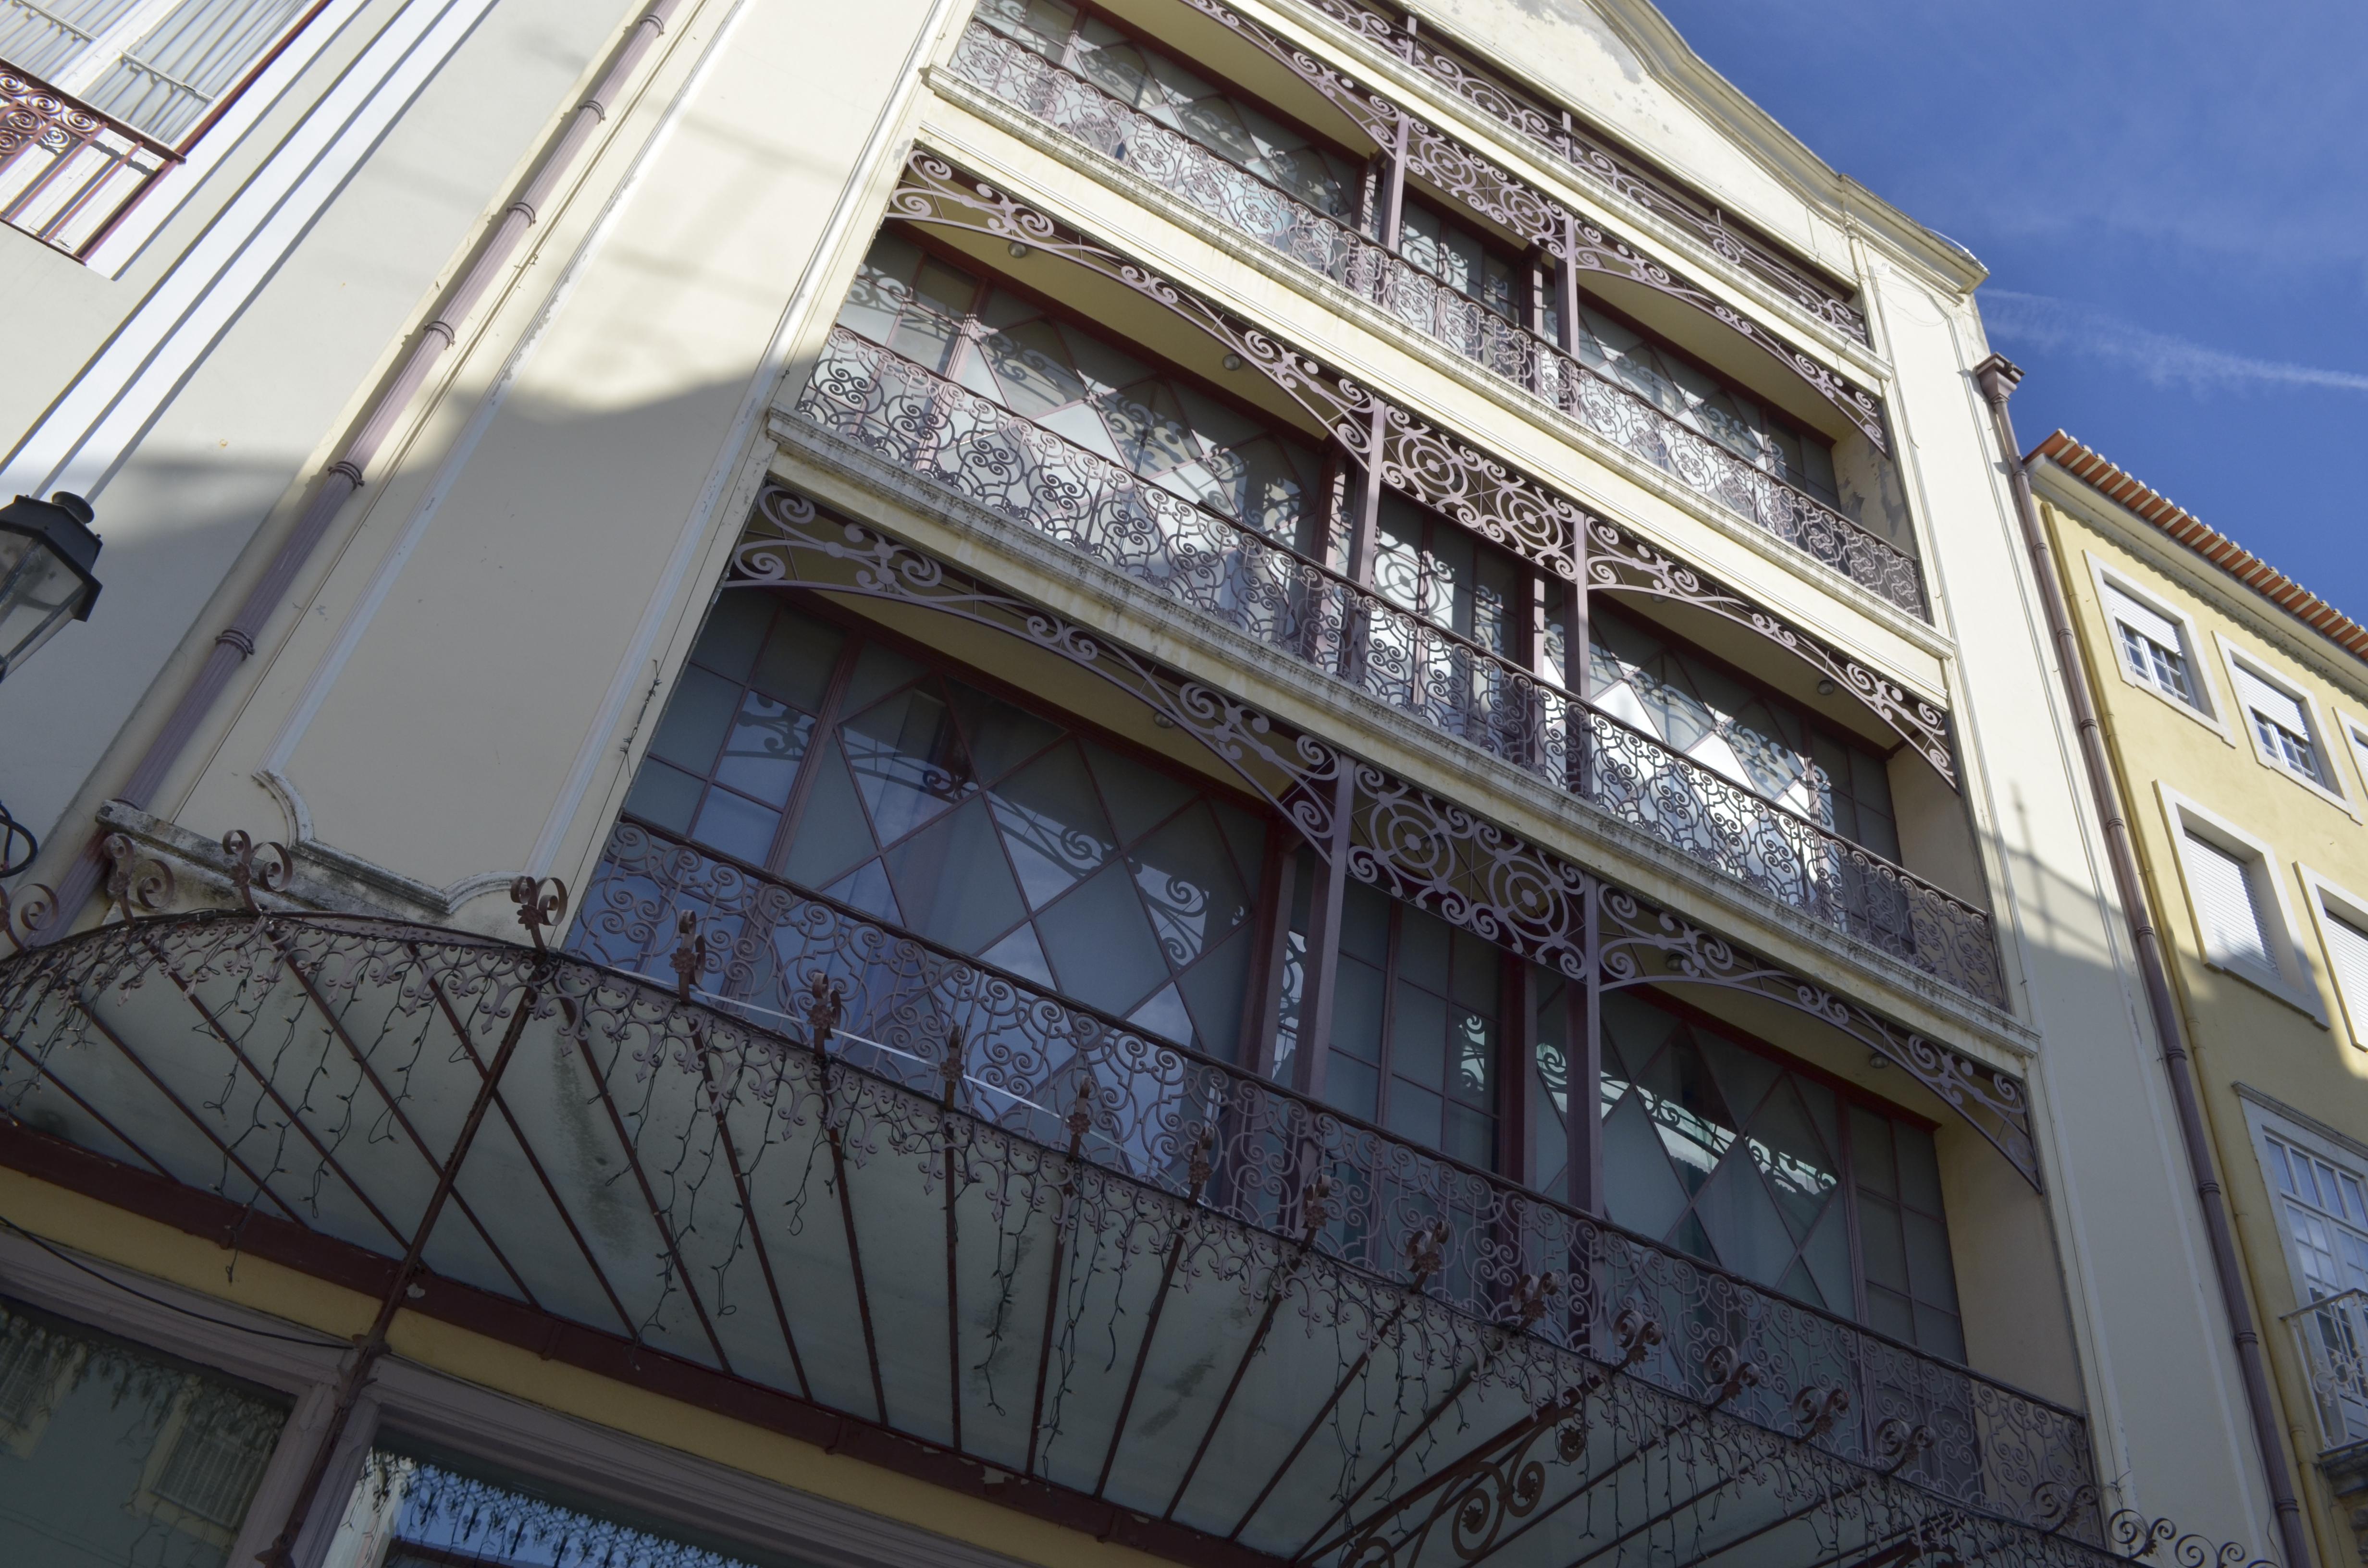 Museu Municipal de Coimbra - Edifício Chiado